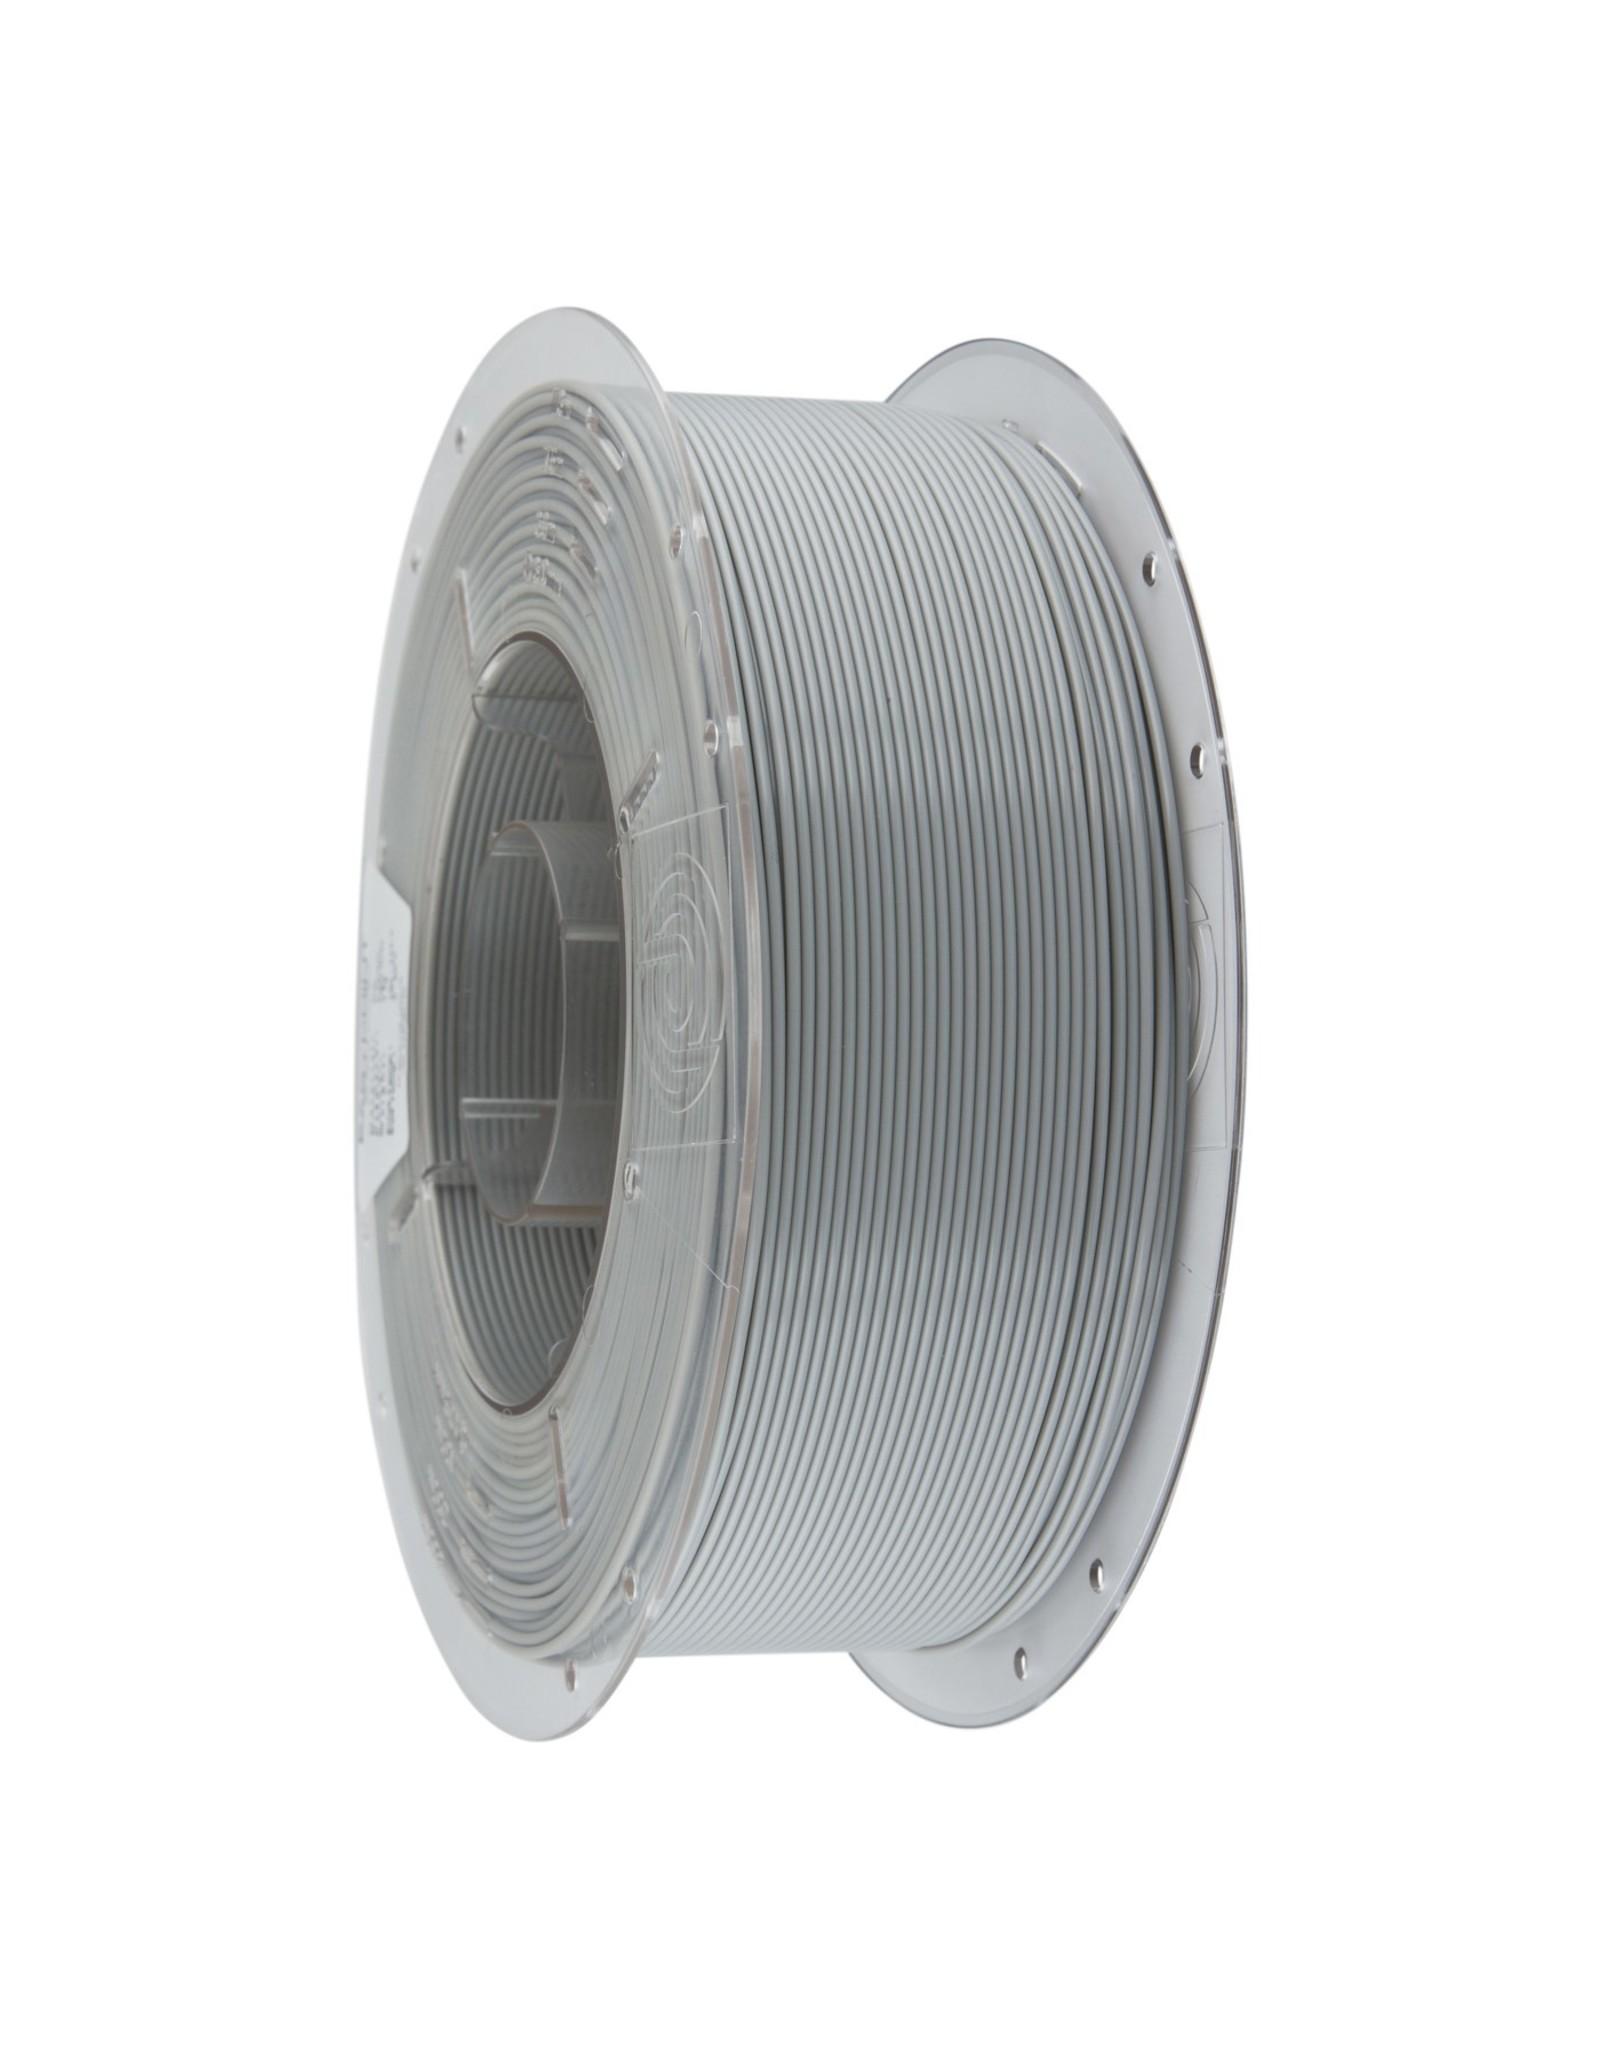 Prima Prima Easyprint PLA 1.75mm 1kg Licht grijs